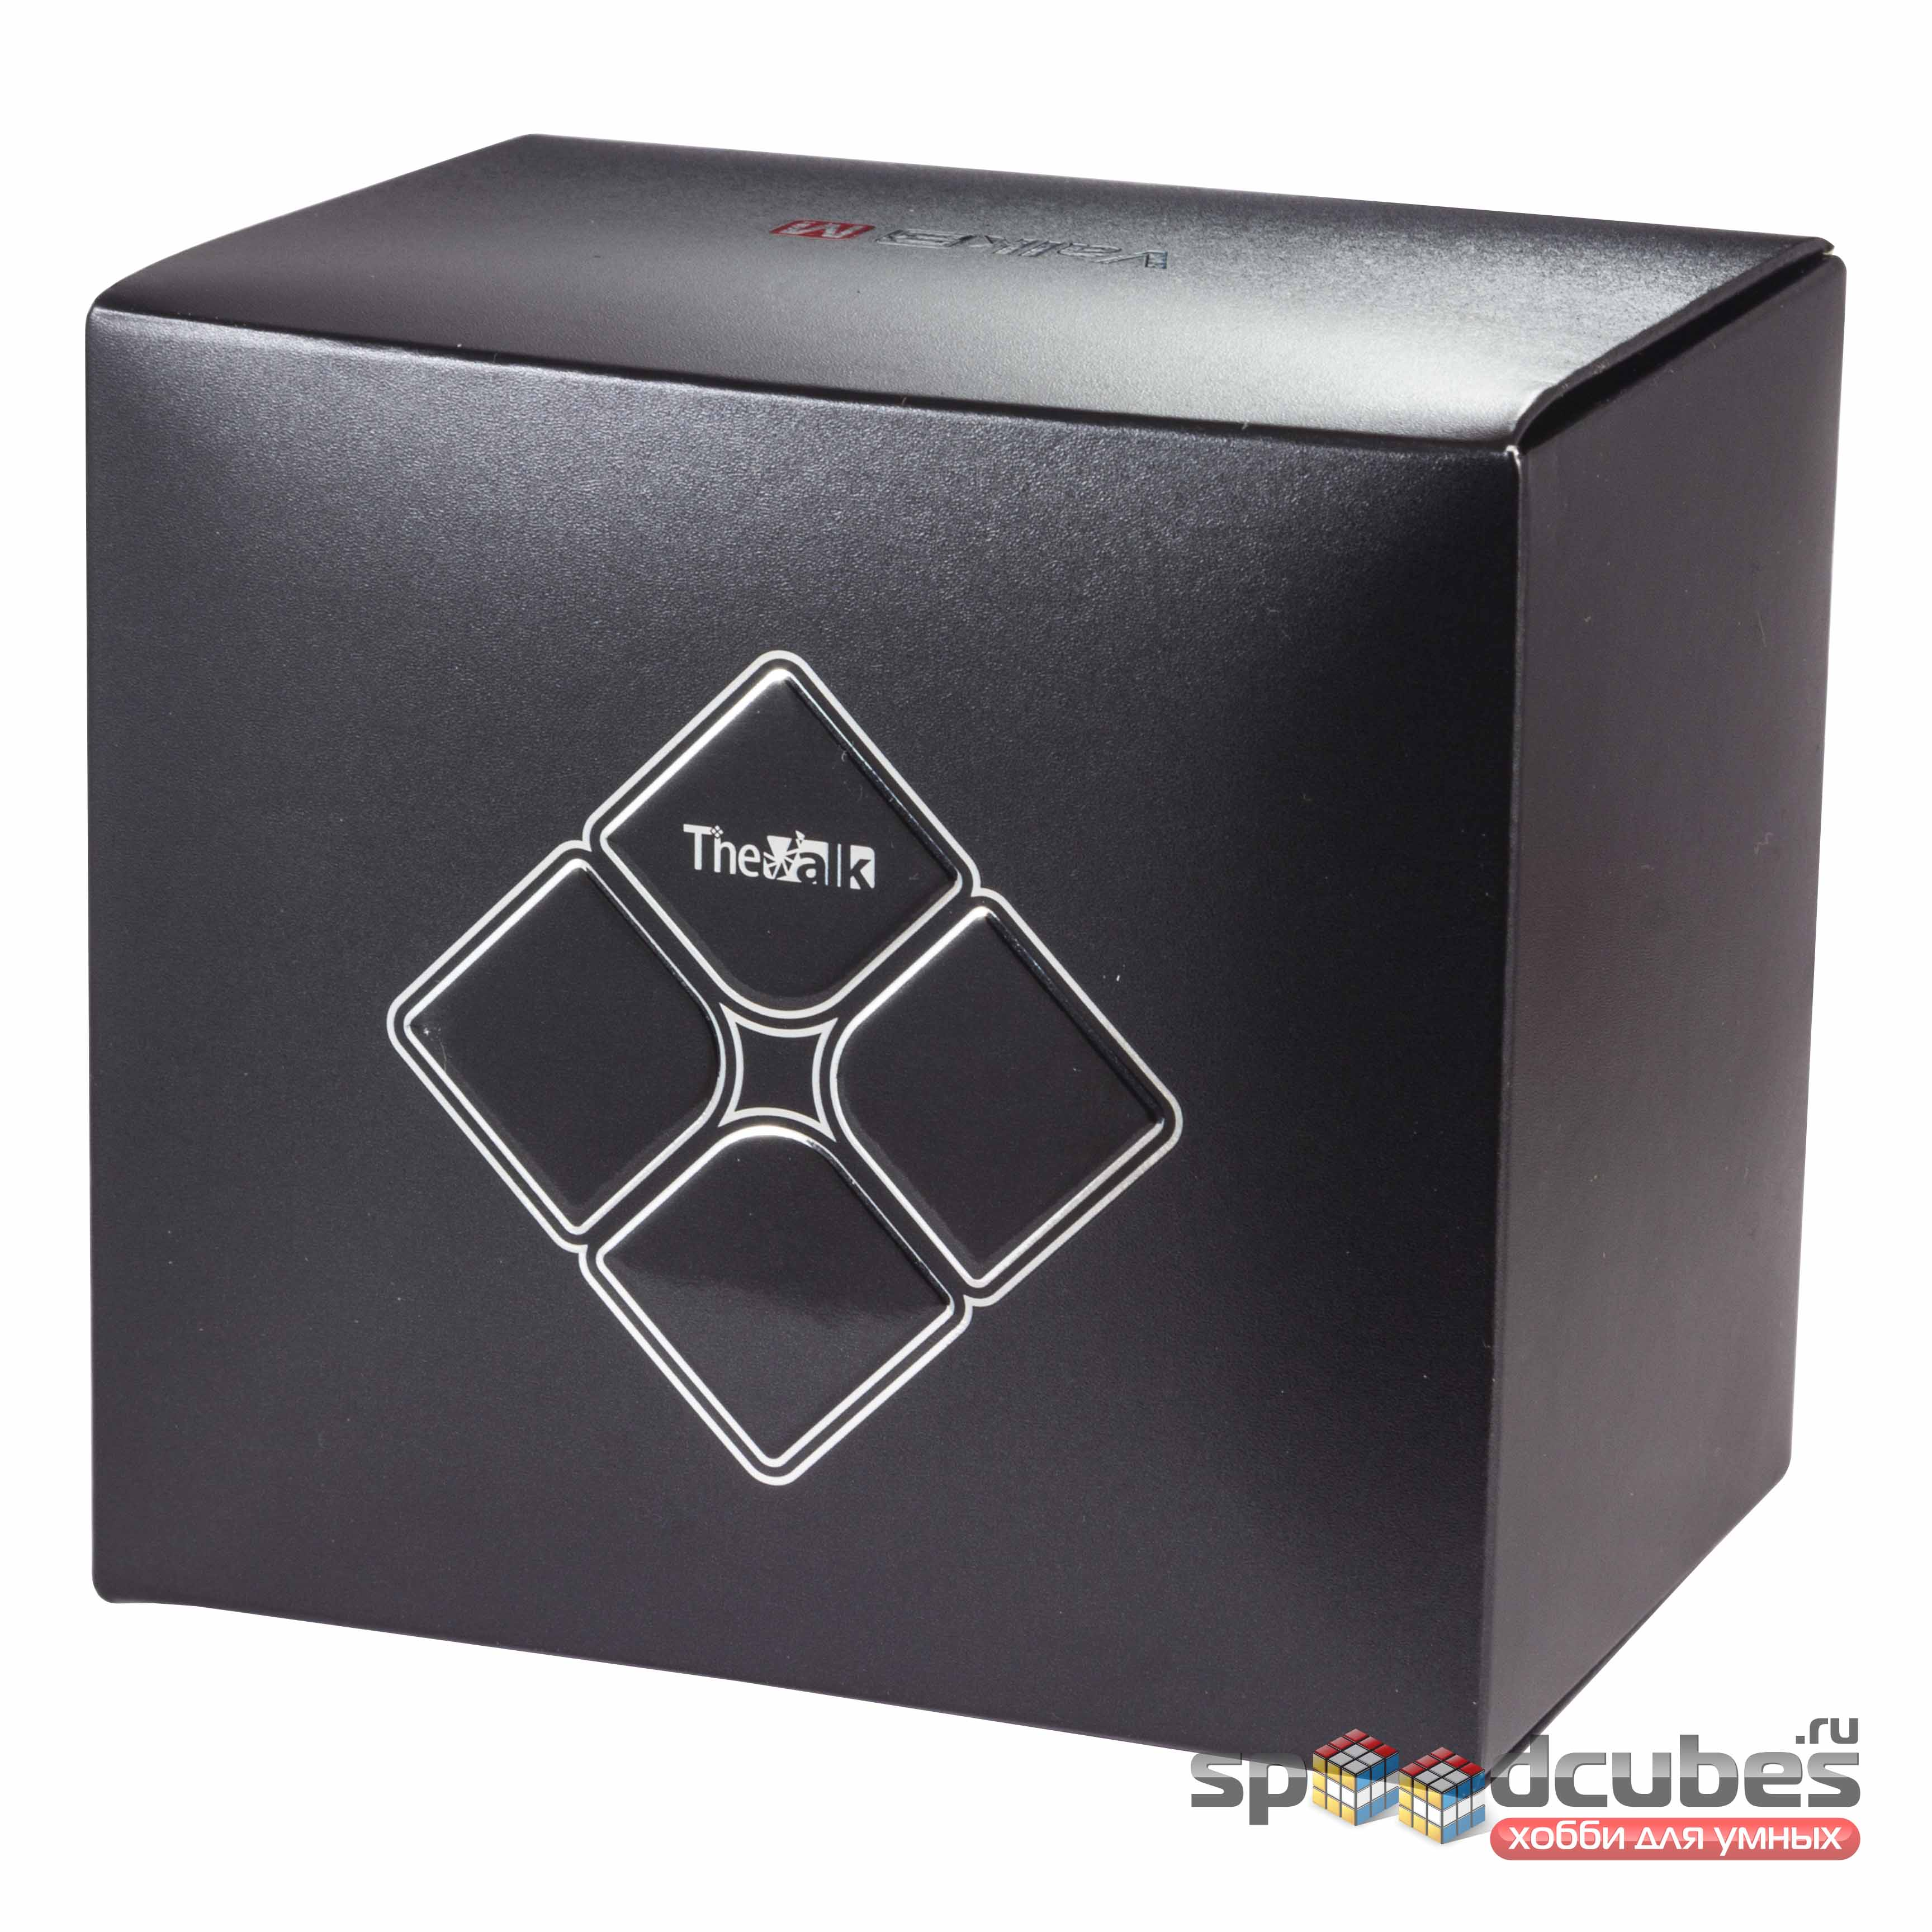 QiYi (MofangGe) 2x2x2 Valk 2M